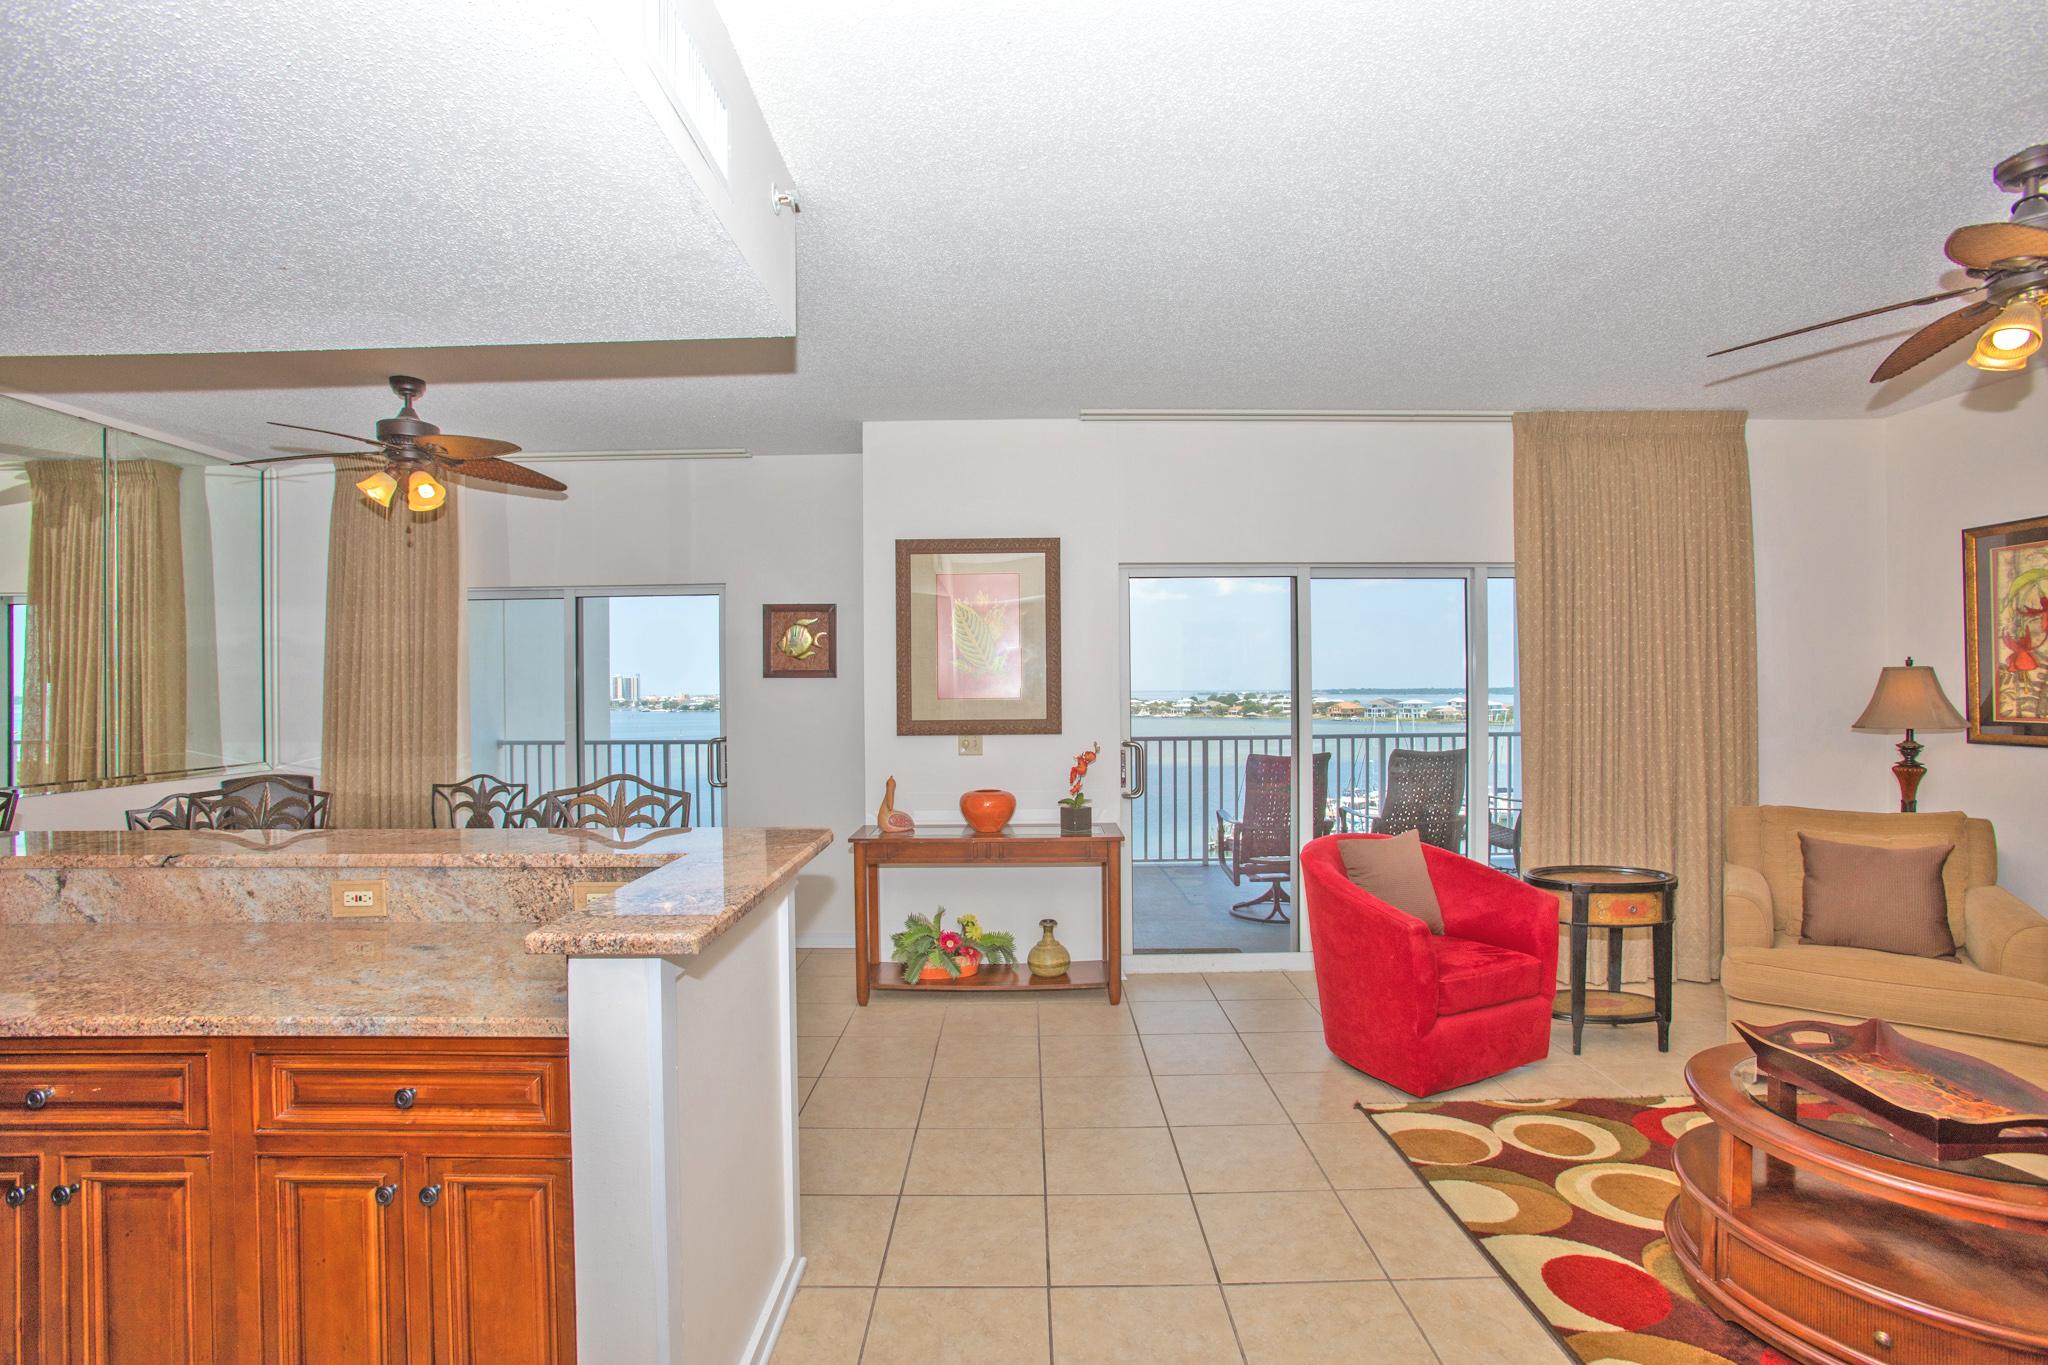 South Harbour #7E Condo rental in South Harbour ~ Pensacola Beach Vacation Rentals by BeachGuide in Pensacola Beach Florida - #10